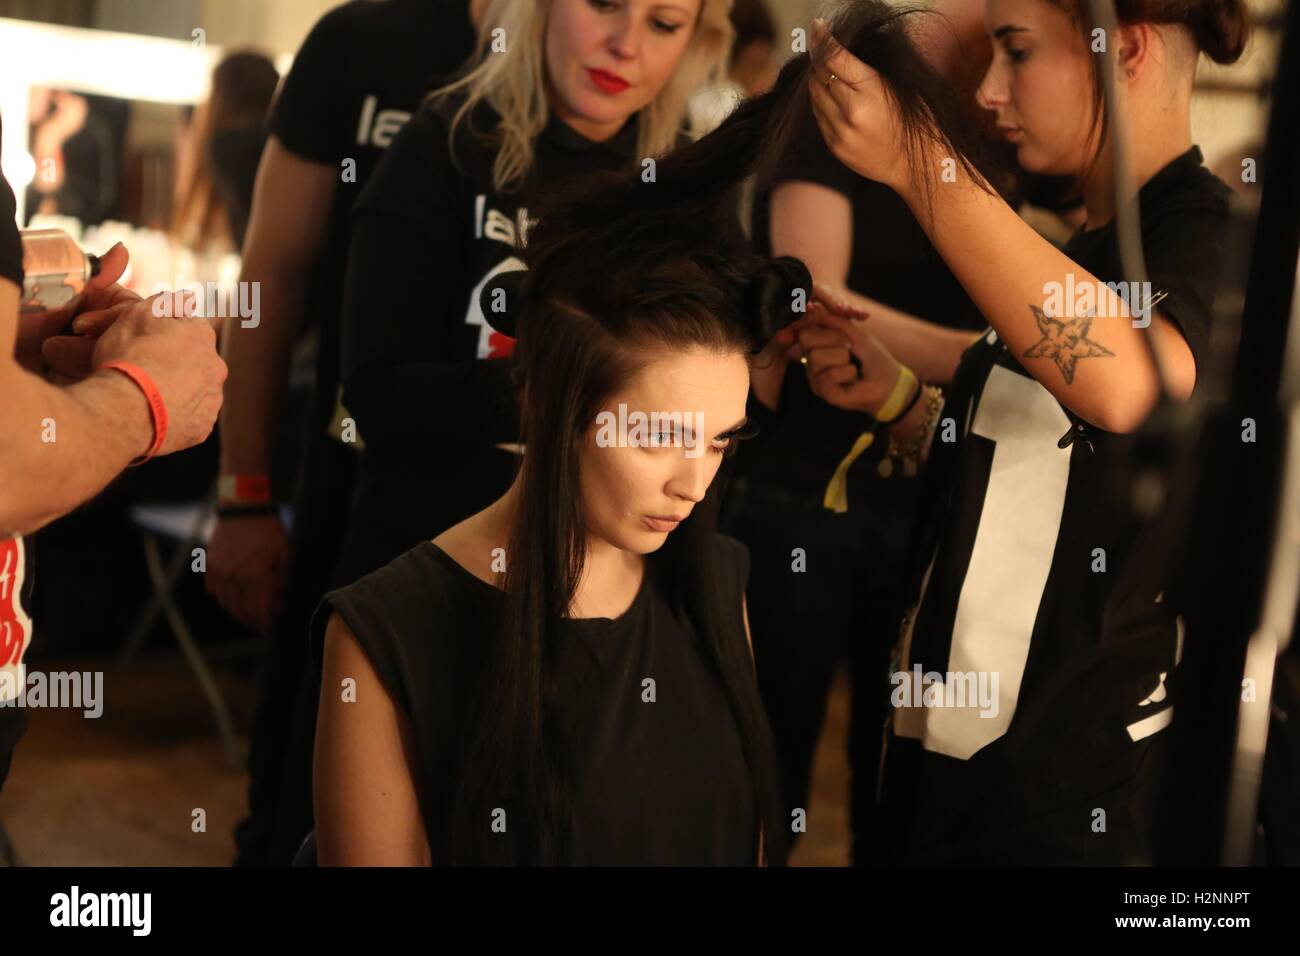 Backstage at London Fashion Week - Stock Image